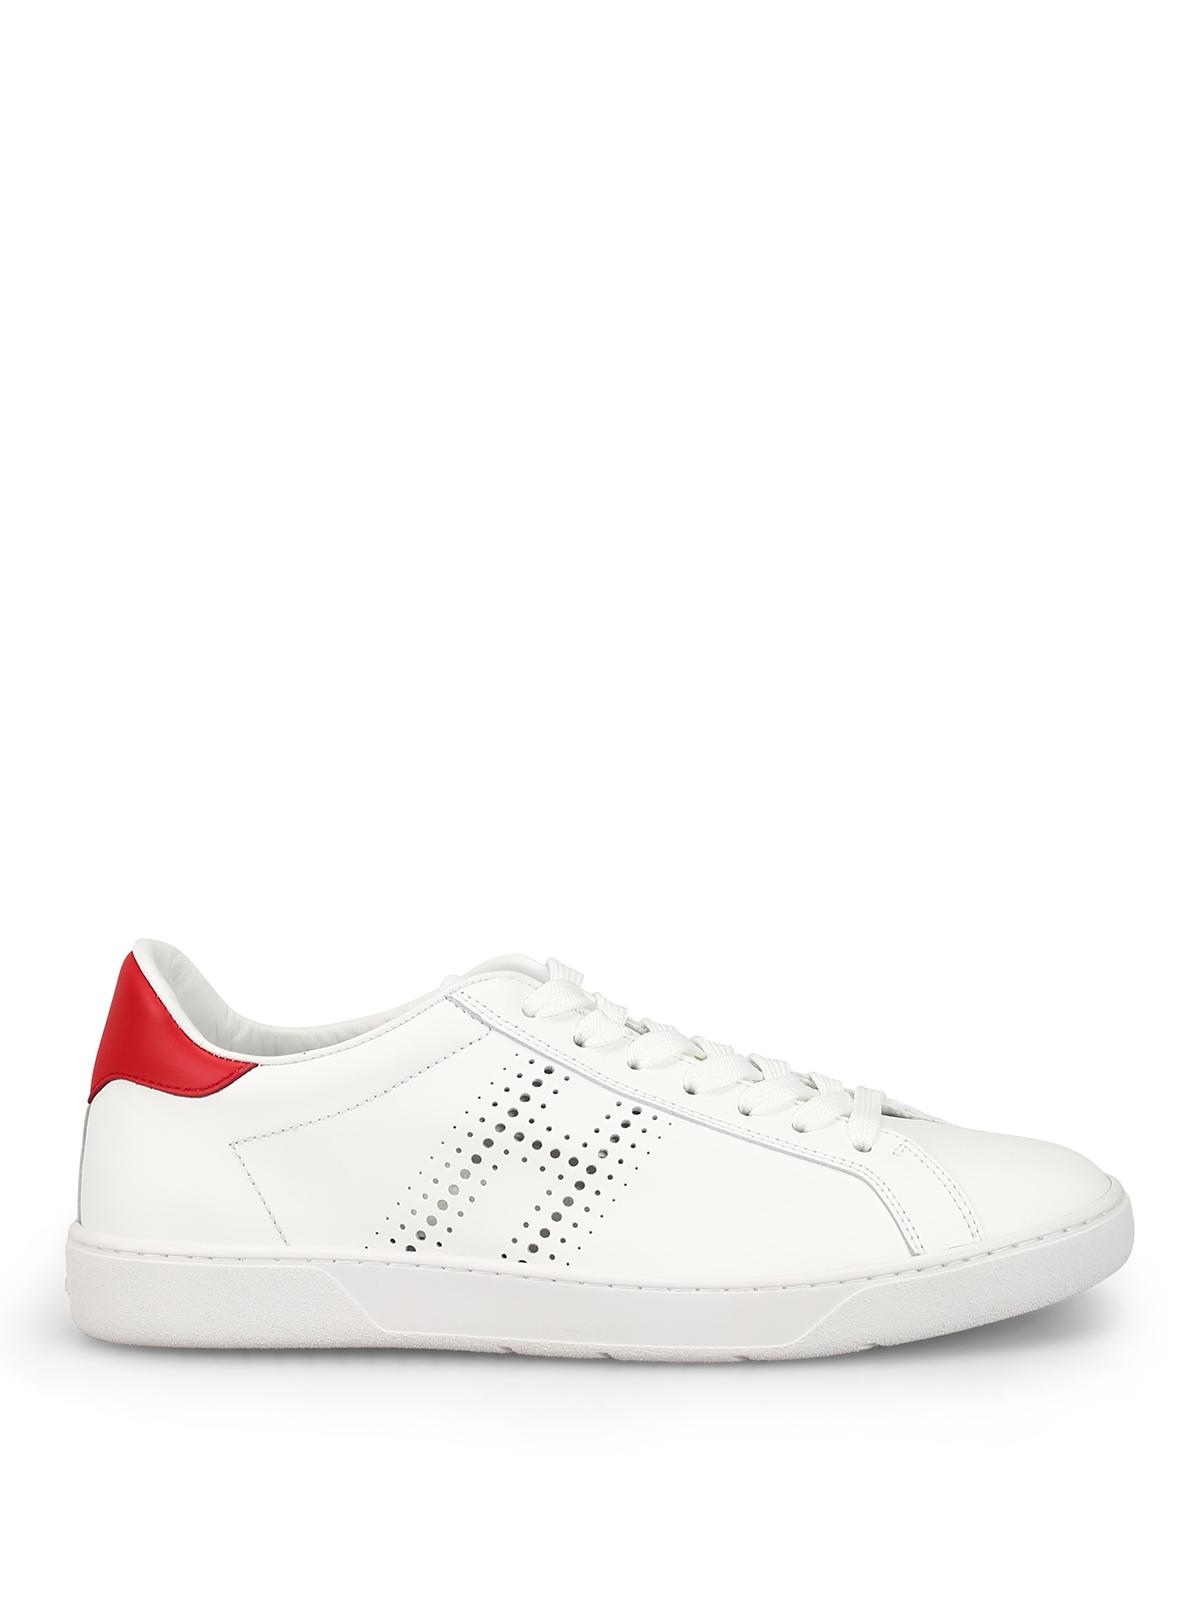 Sneakers Hogan - Sneaker H327 in pelle liscia - GYM3270BT10JBF0029